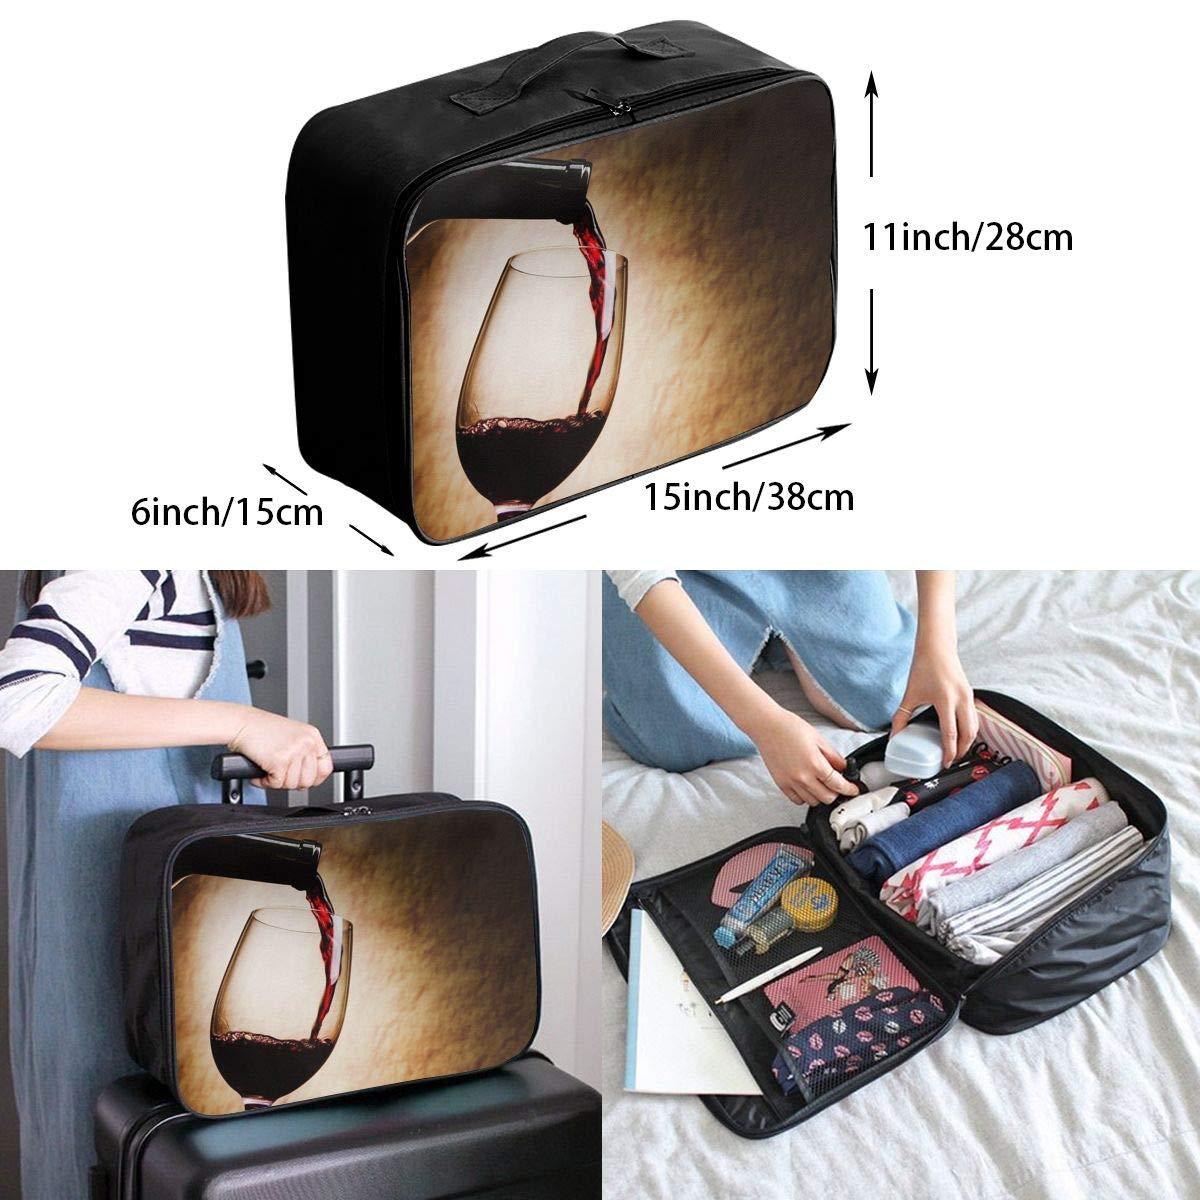 Travel Luggage Duffle Bag Lightweight Portable Handbag Red Wine Glasses Large Capacity Waterproof Foldable Storage Tote